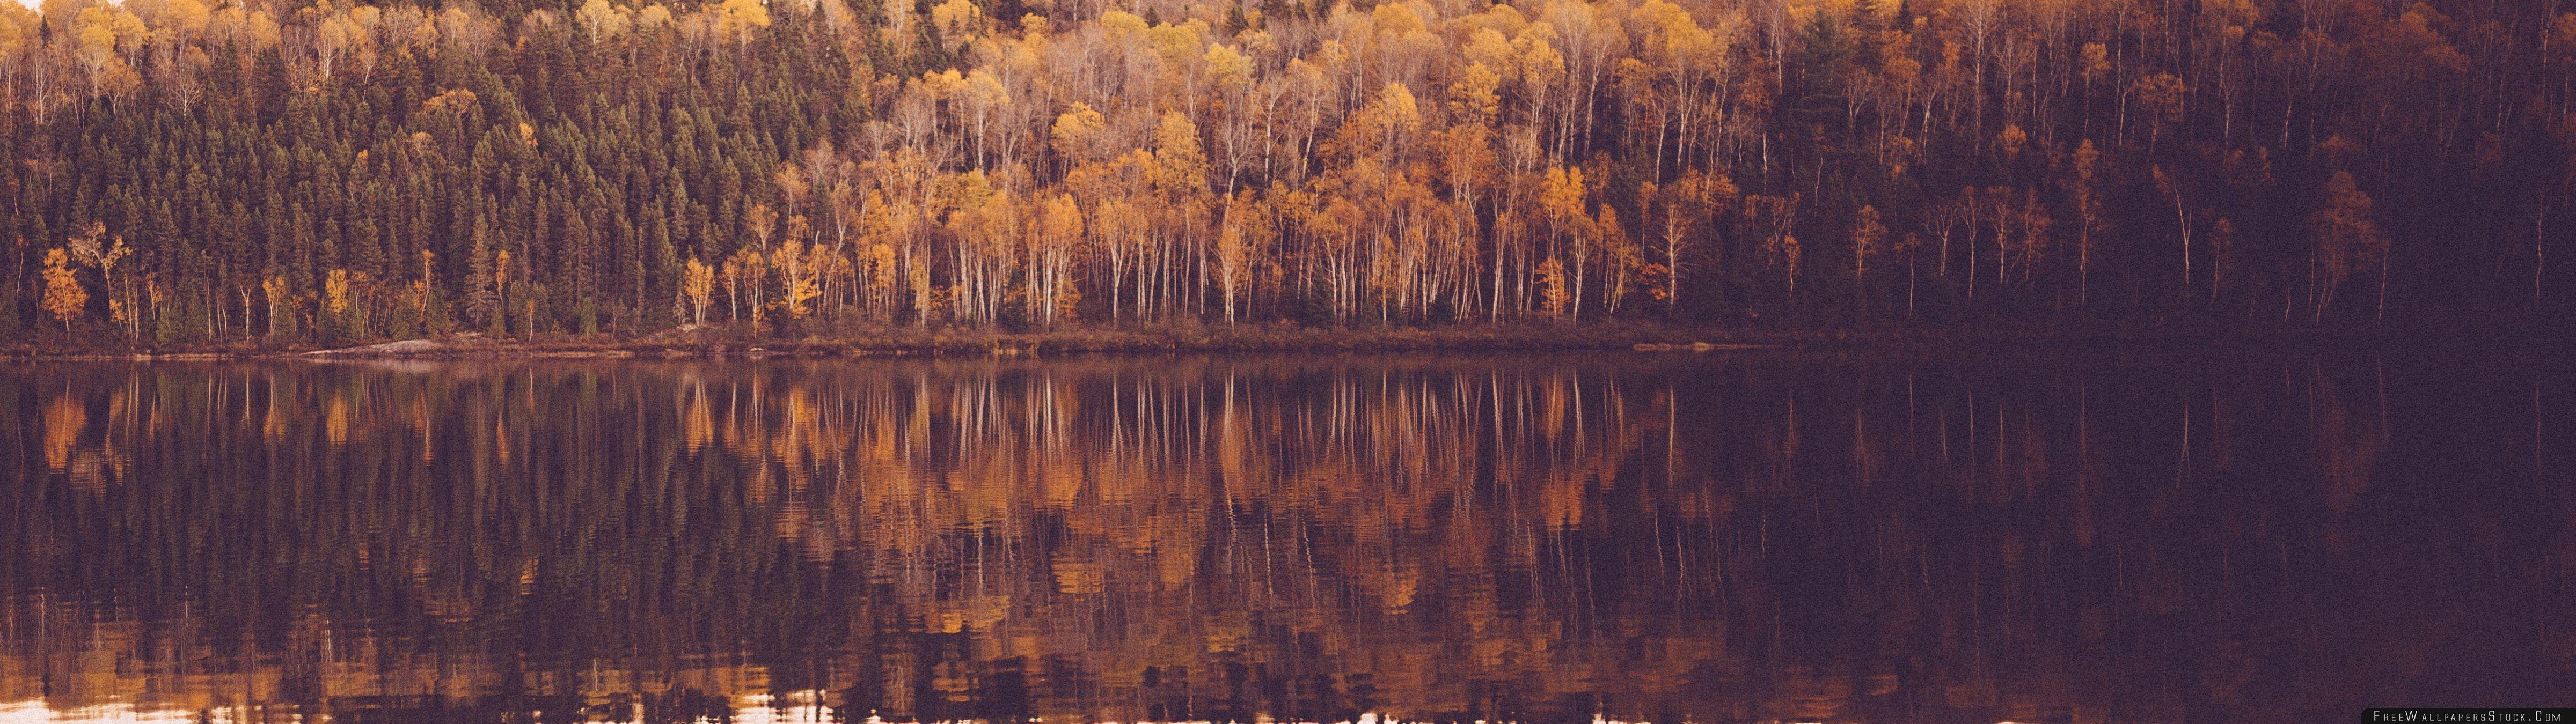 Download Free Wallpaper Vintage Woods